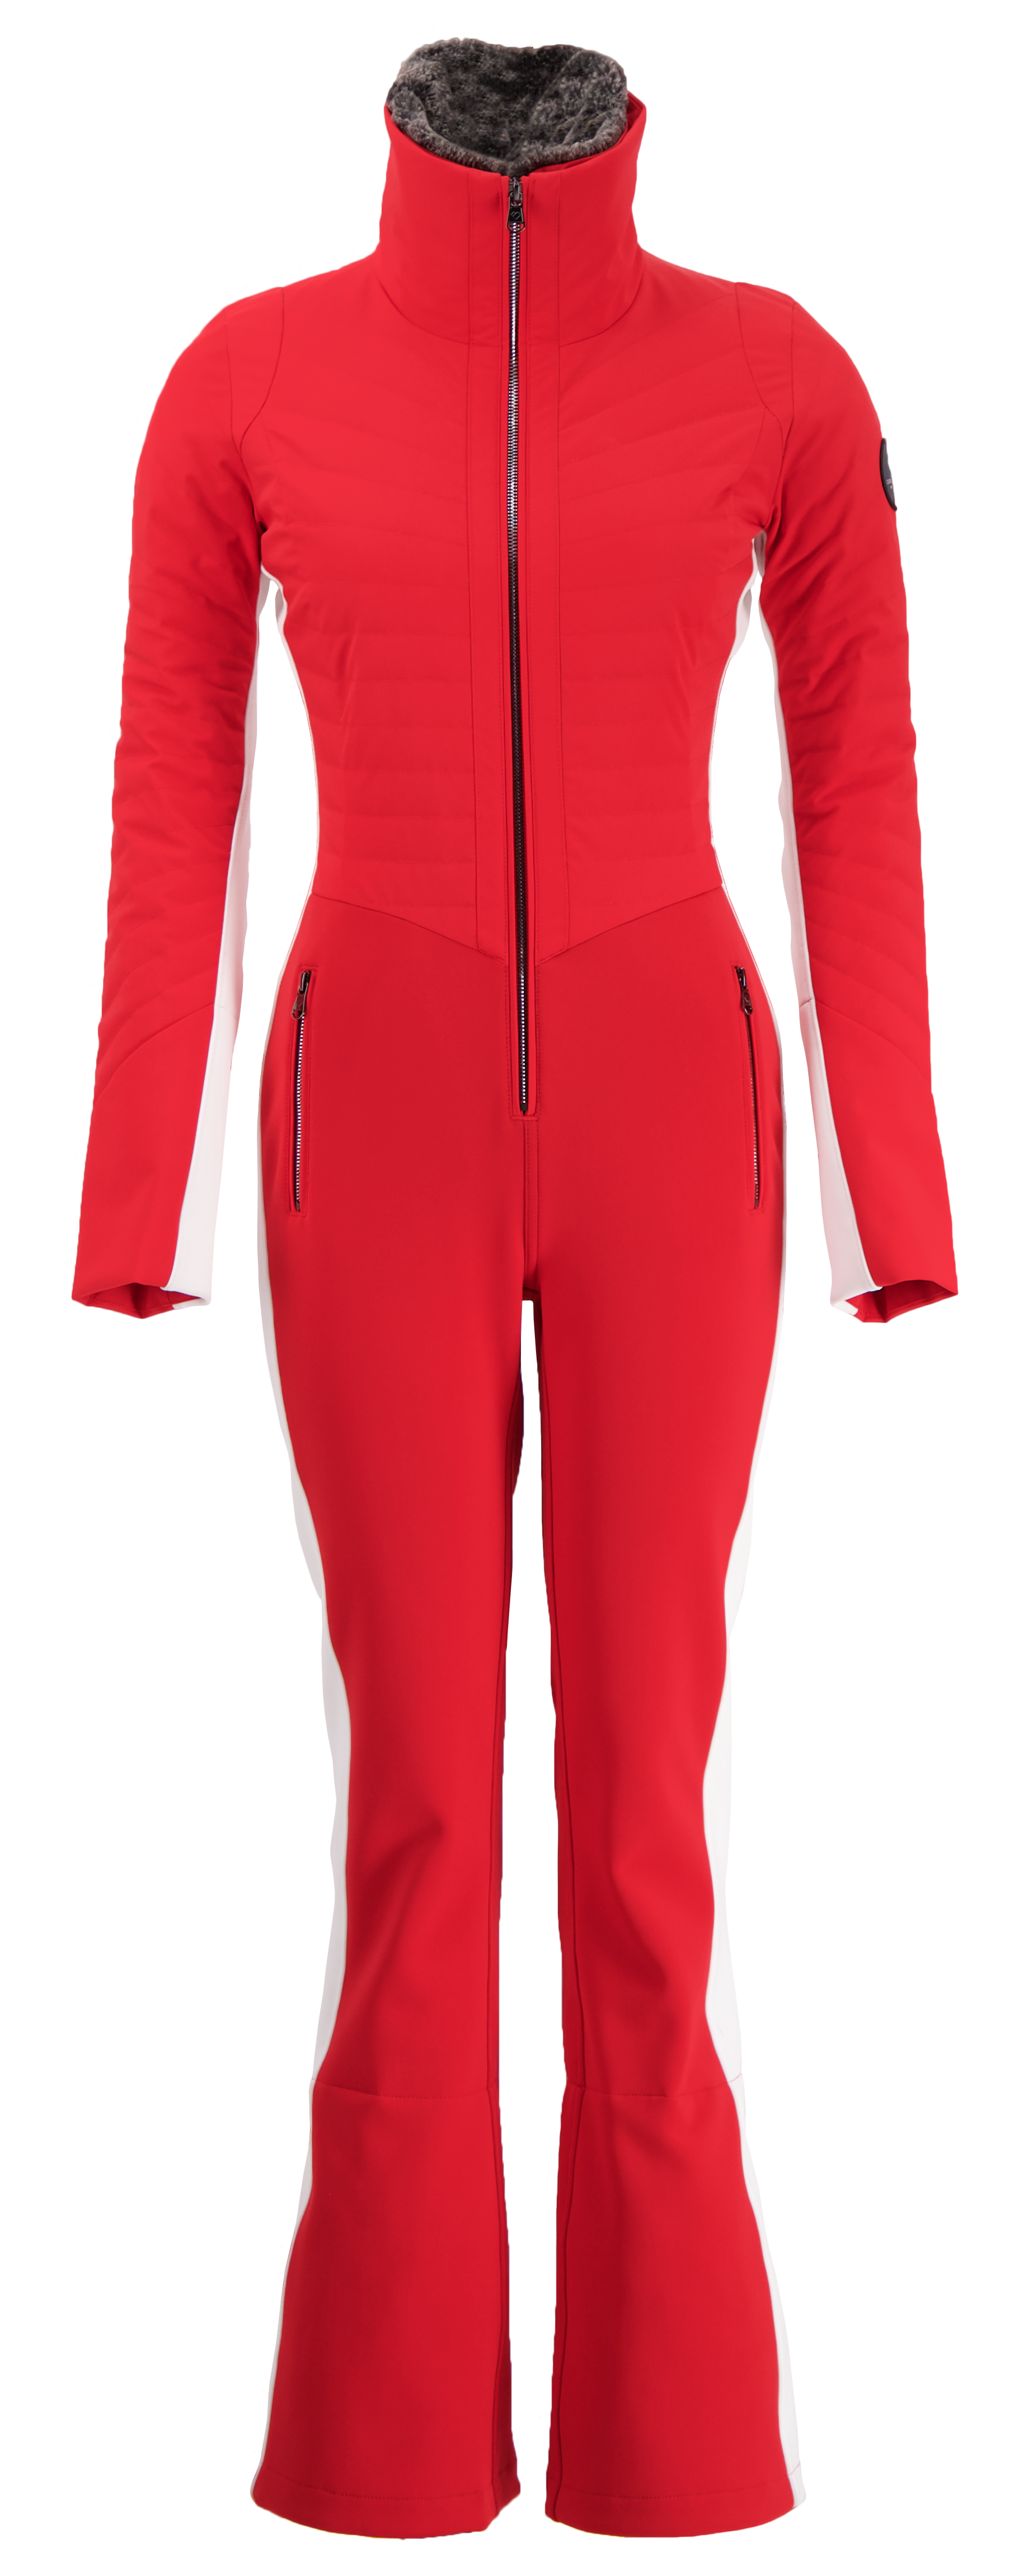 Roz Groenewoud, pro skier